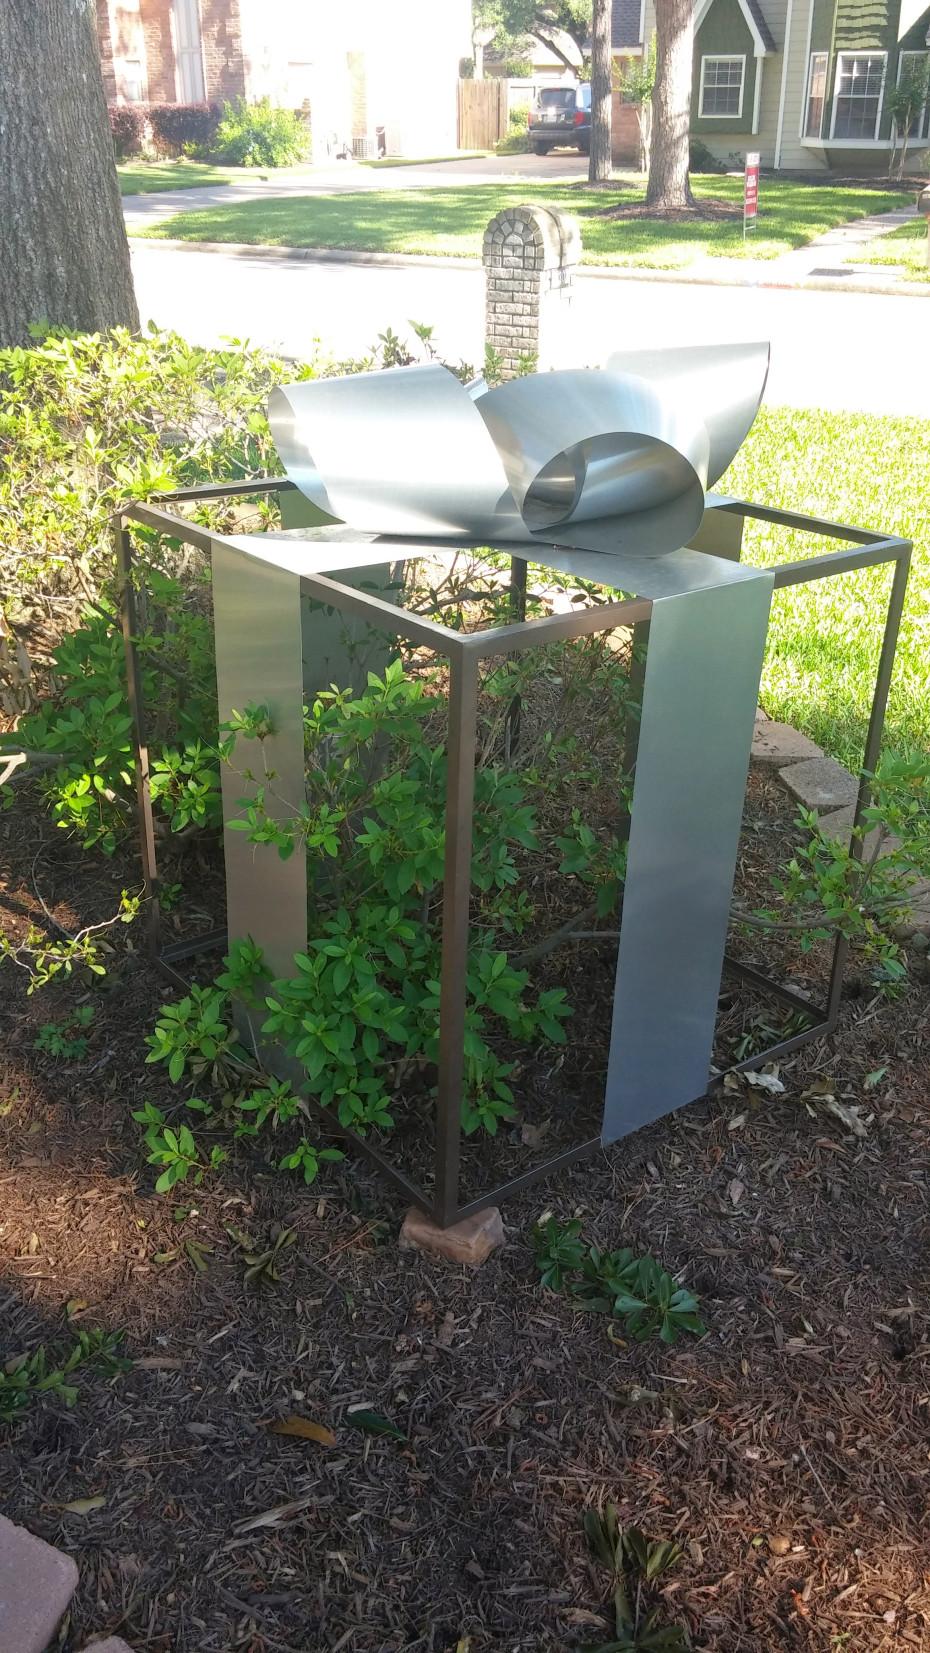 Cage, 2015, Steel Aluminum Paint, 36 x 36 x 36